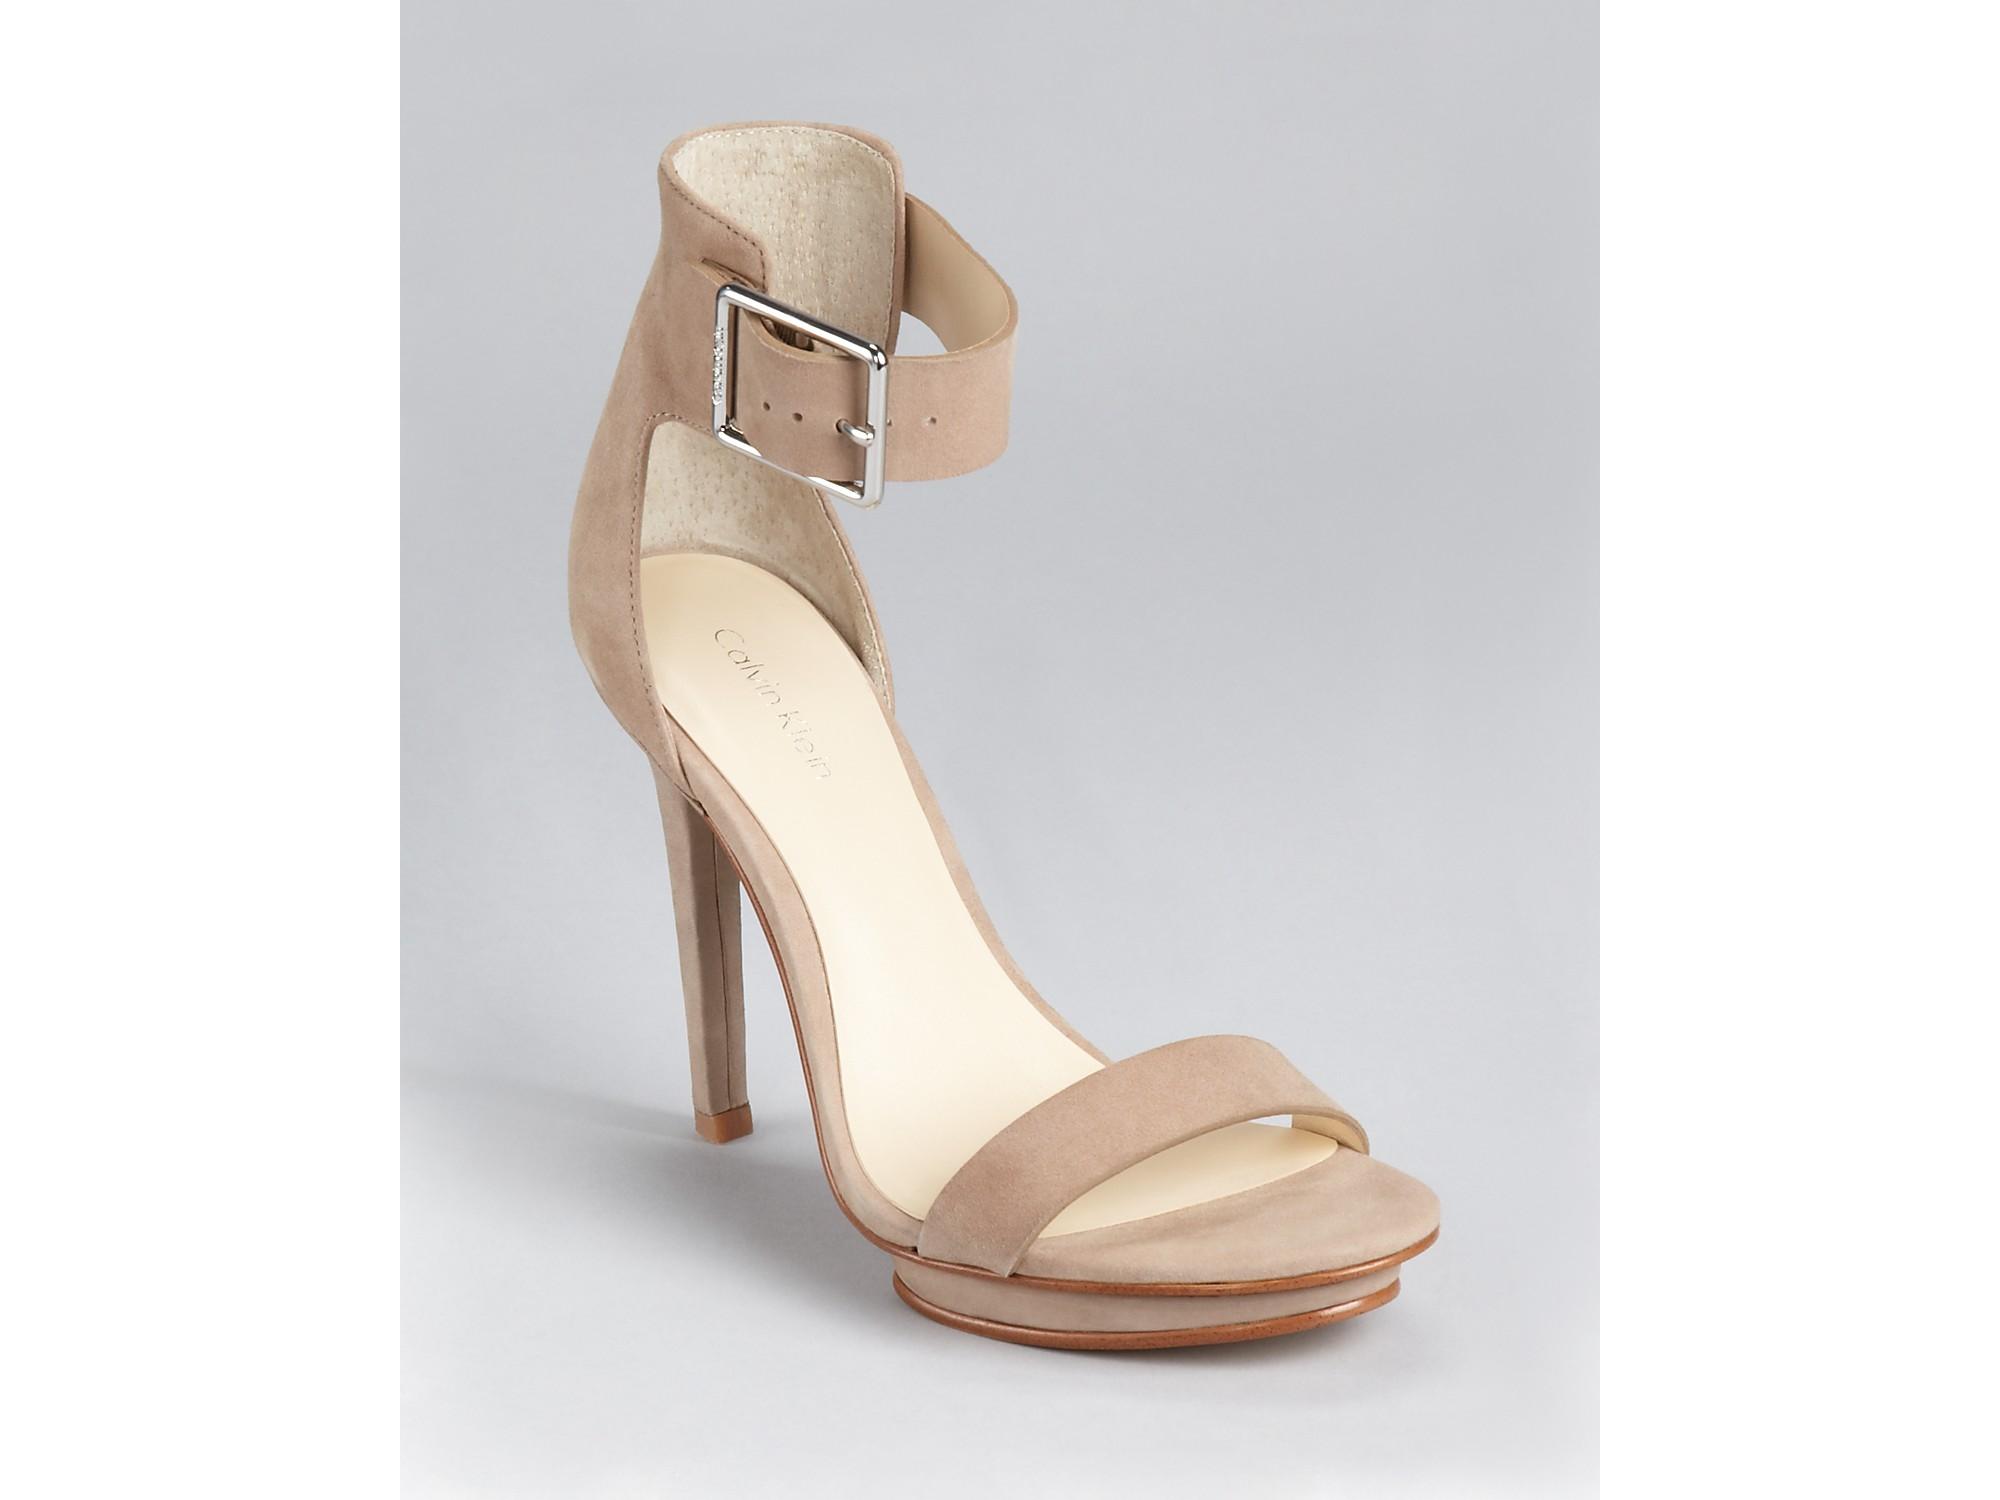 06cdf9ce7be3 Lyst - Calvin Klein Sandals Vivian Ankle Strap in Brown